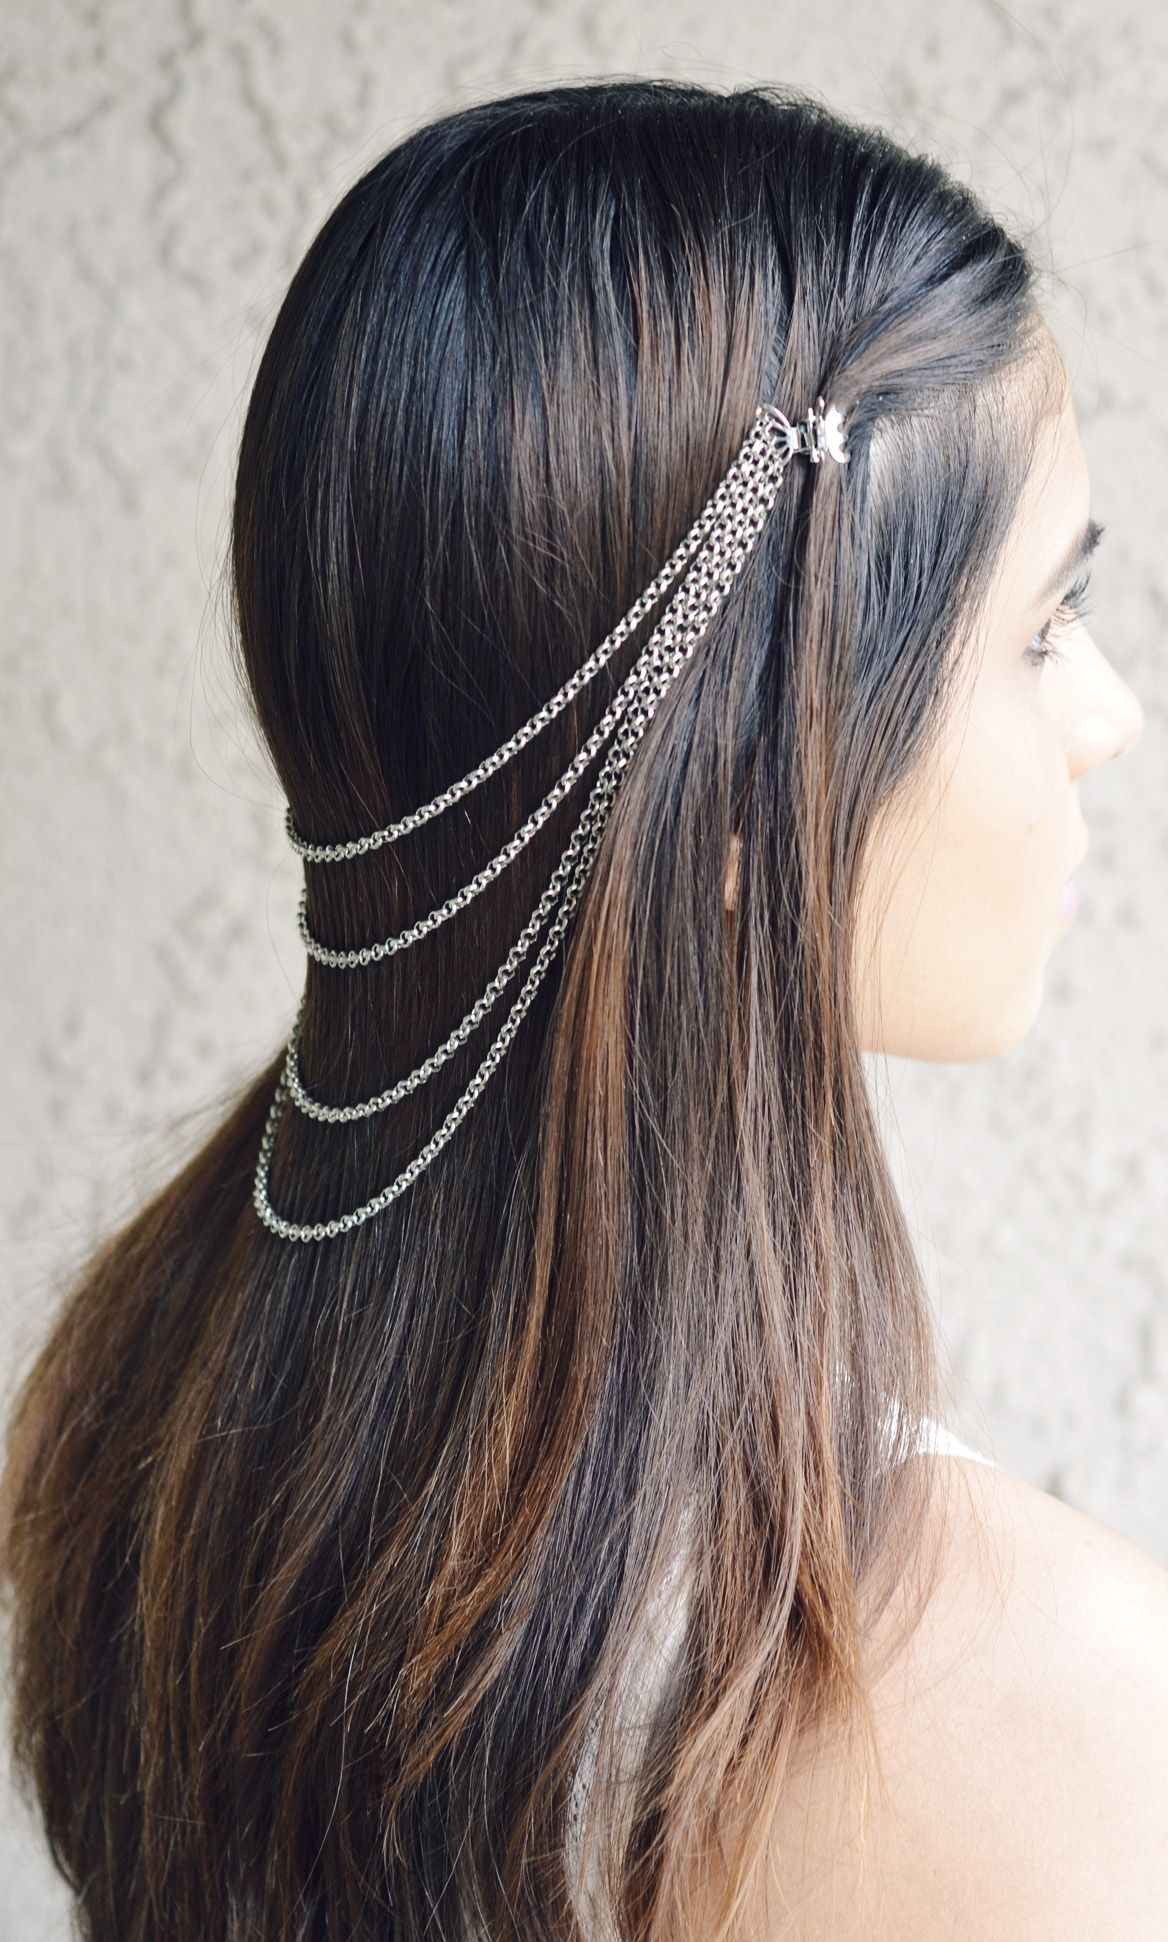 New Cute Fashion Hair Accessory Multilayer Golden Chain Headband Hair Band